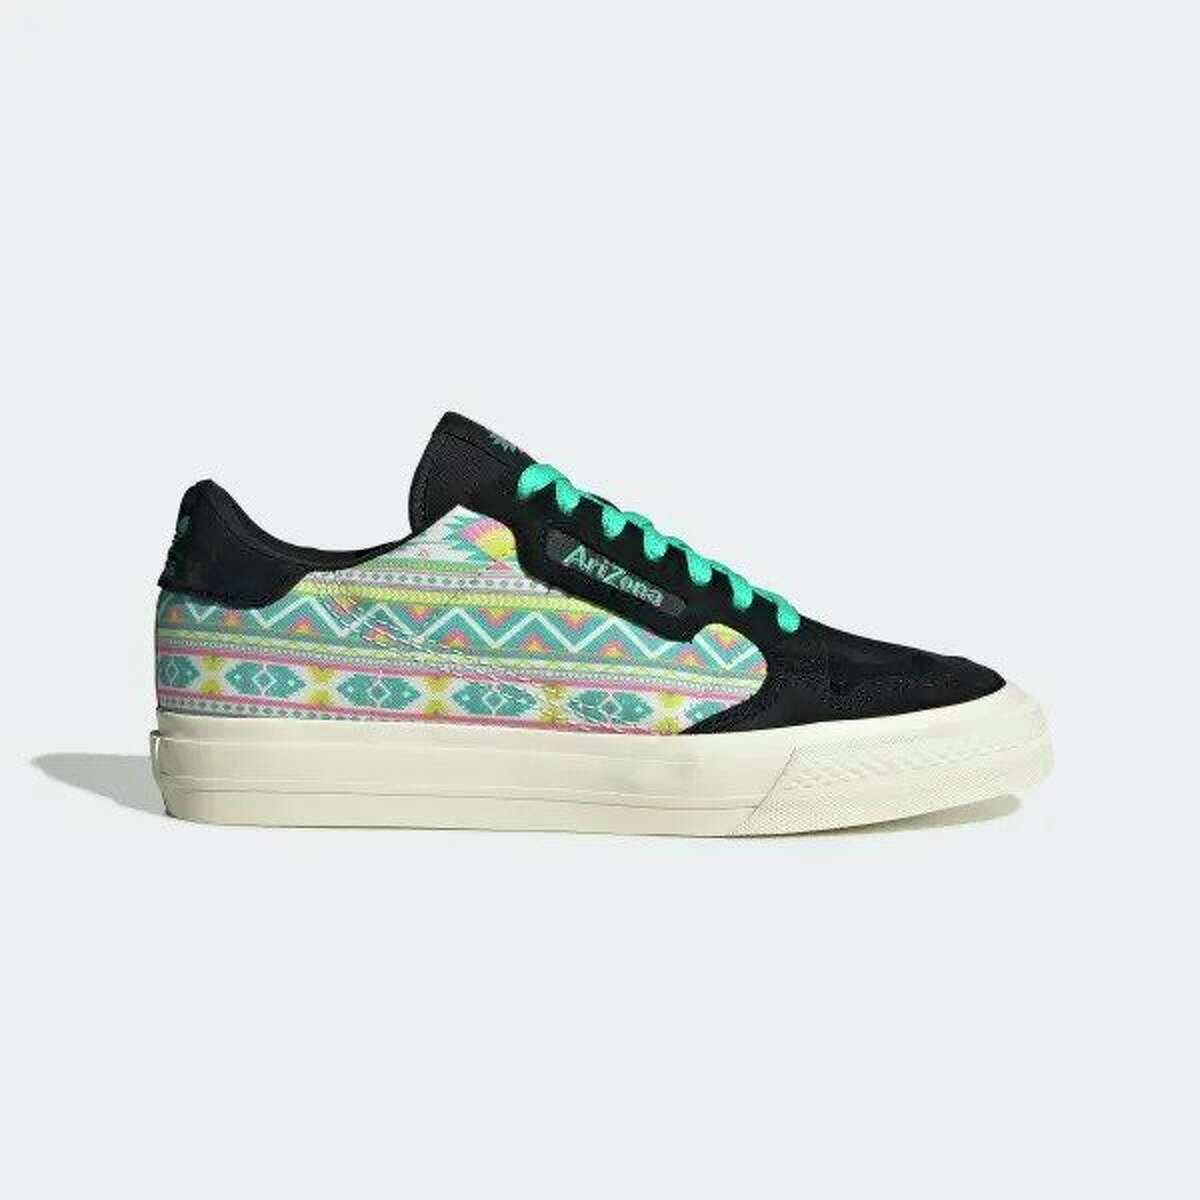 Adidas x Arizona Iced Tea Continental Vulc shoes - $65 Buy here